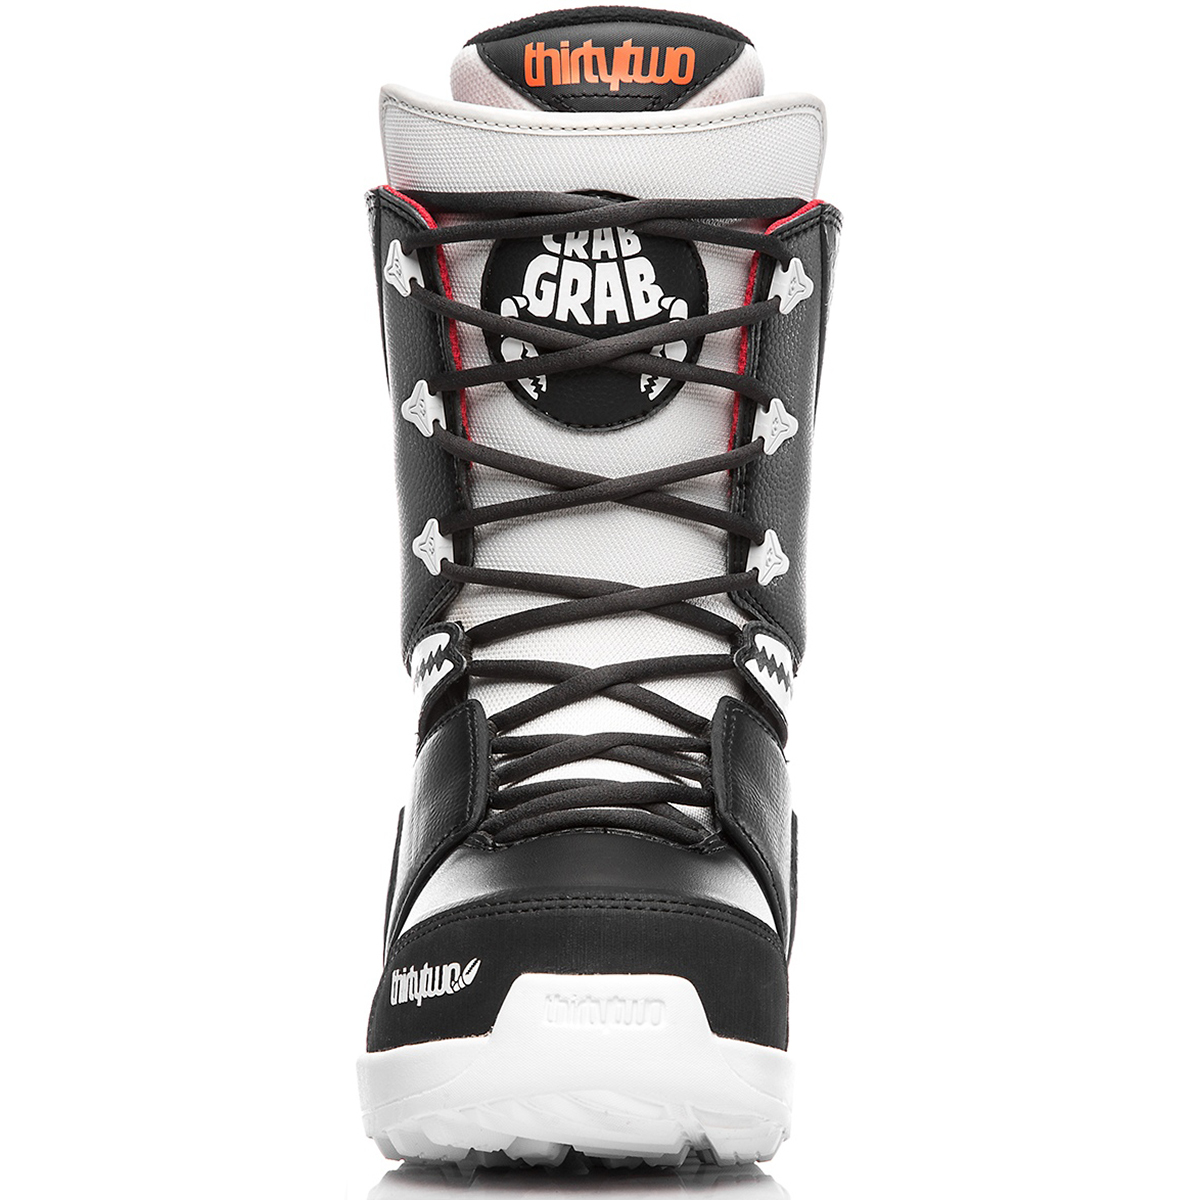 Ботинки для сноуборда ThirtyTwo  Lashed Crab Grab '18 black raw